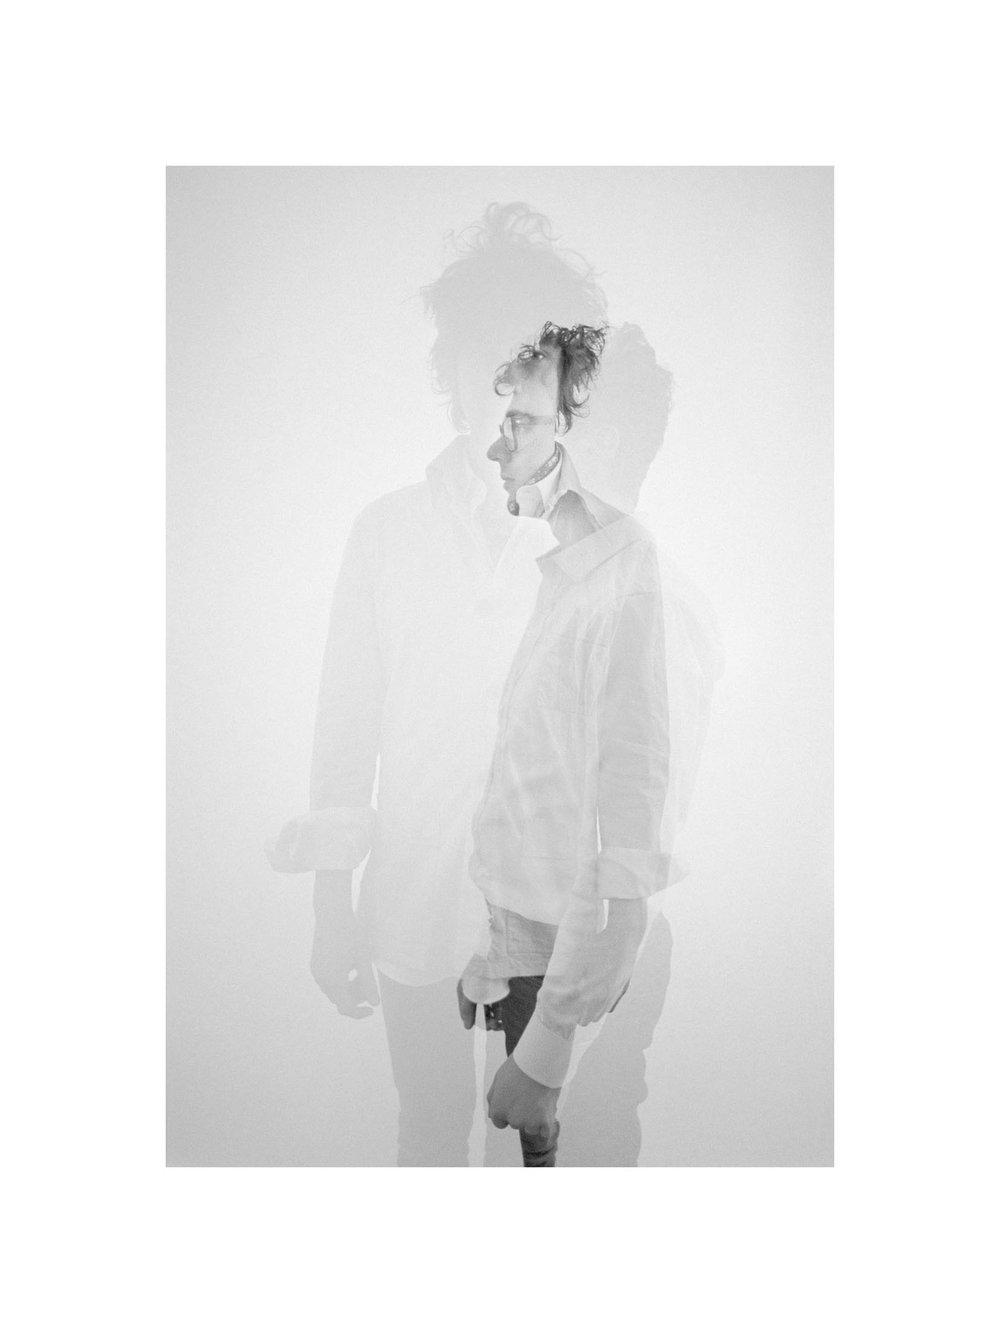 Portrait - MGMT - 01.jpg